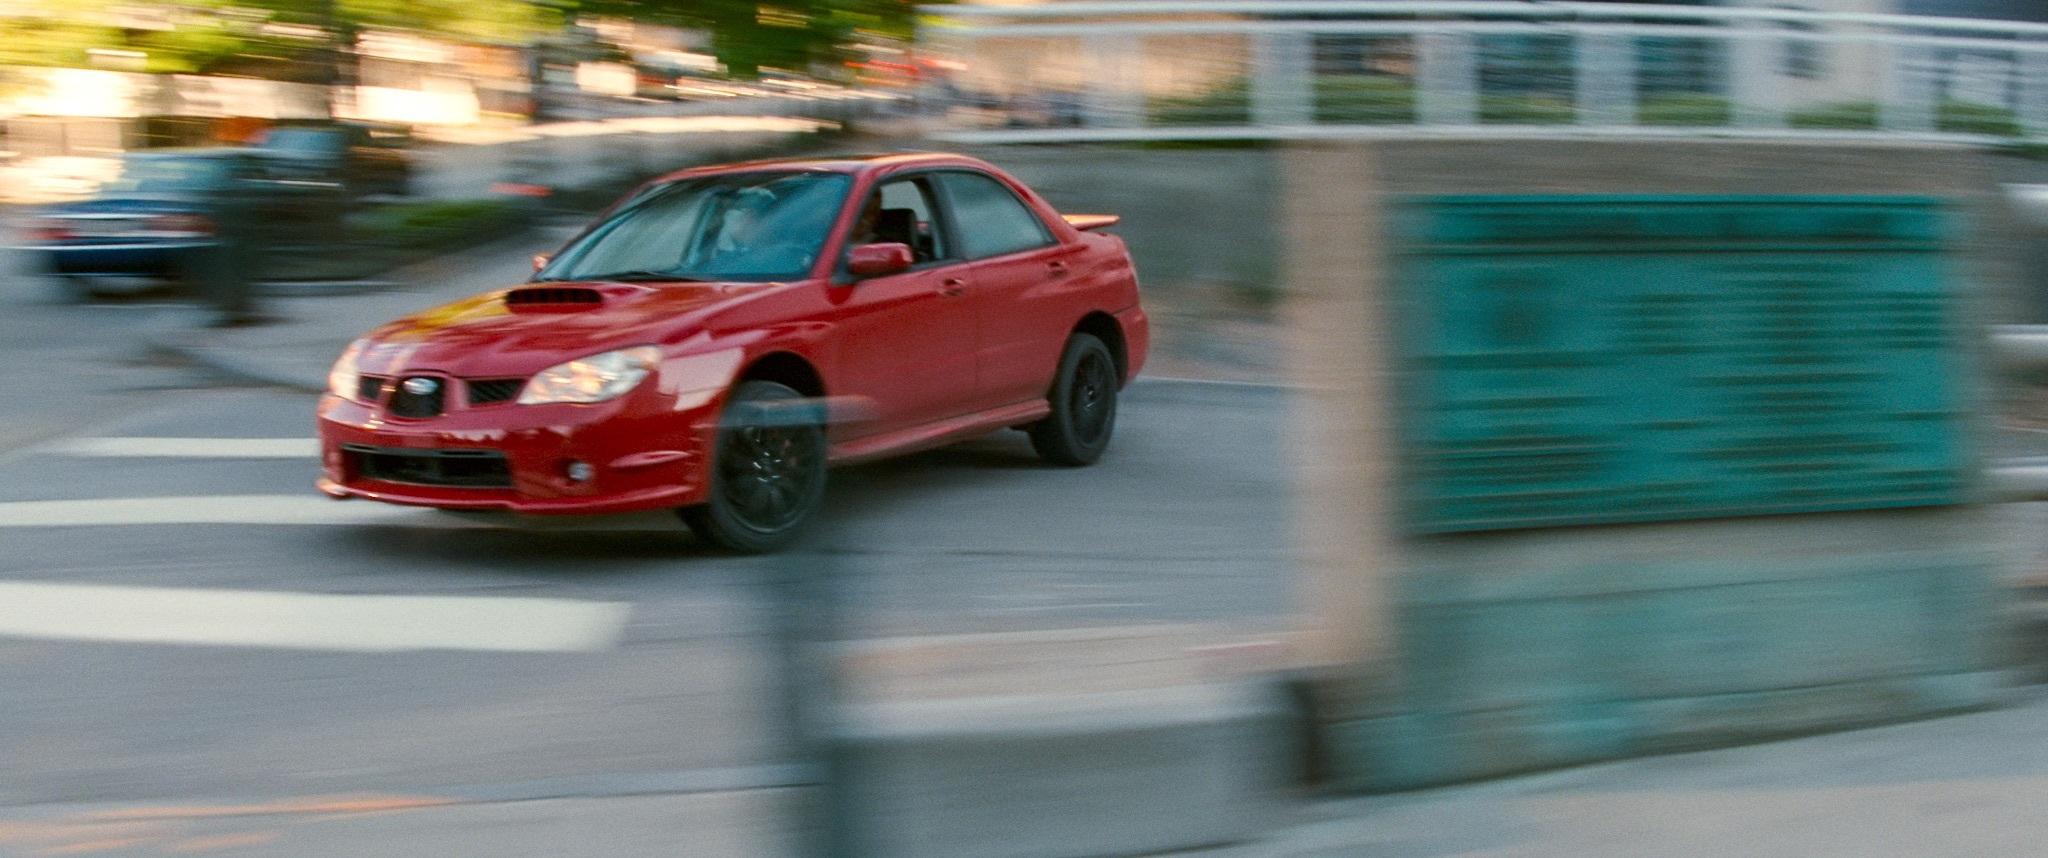 Baby Driver film impreza drift action